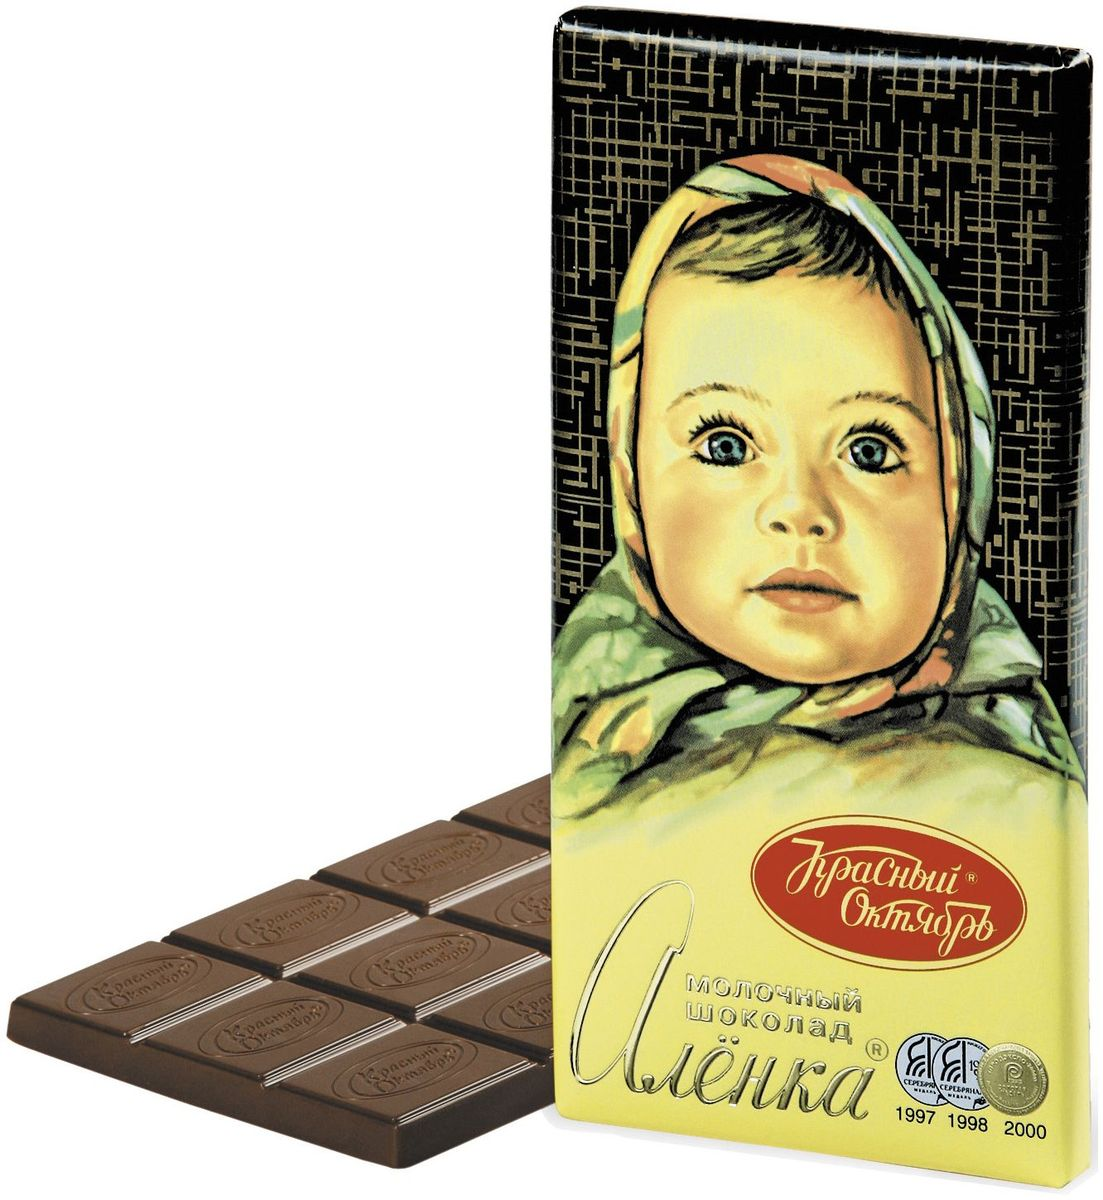 Красный Октябрь Аленка молочный шоколад, 100 г chokocat любимой дочке молочный шоколад 60 г